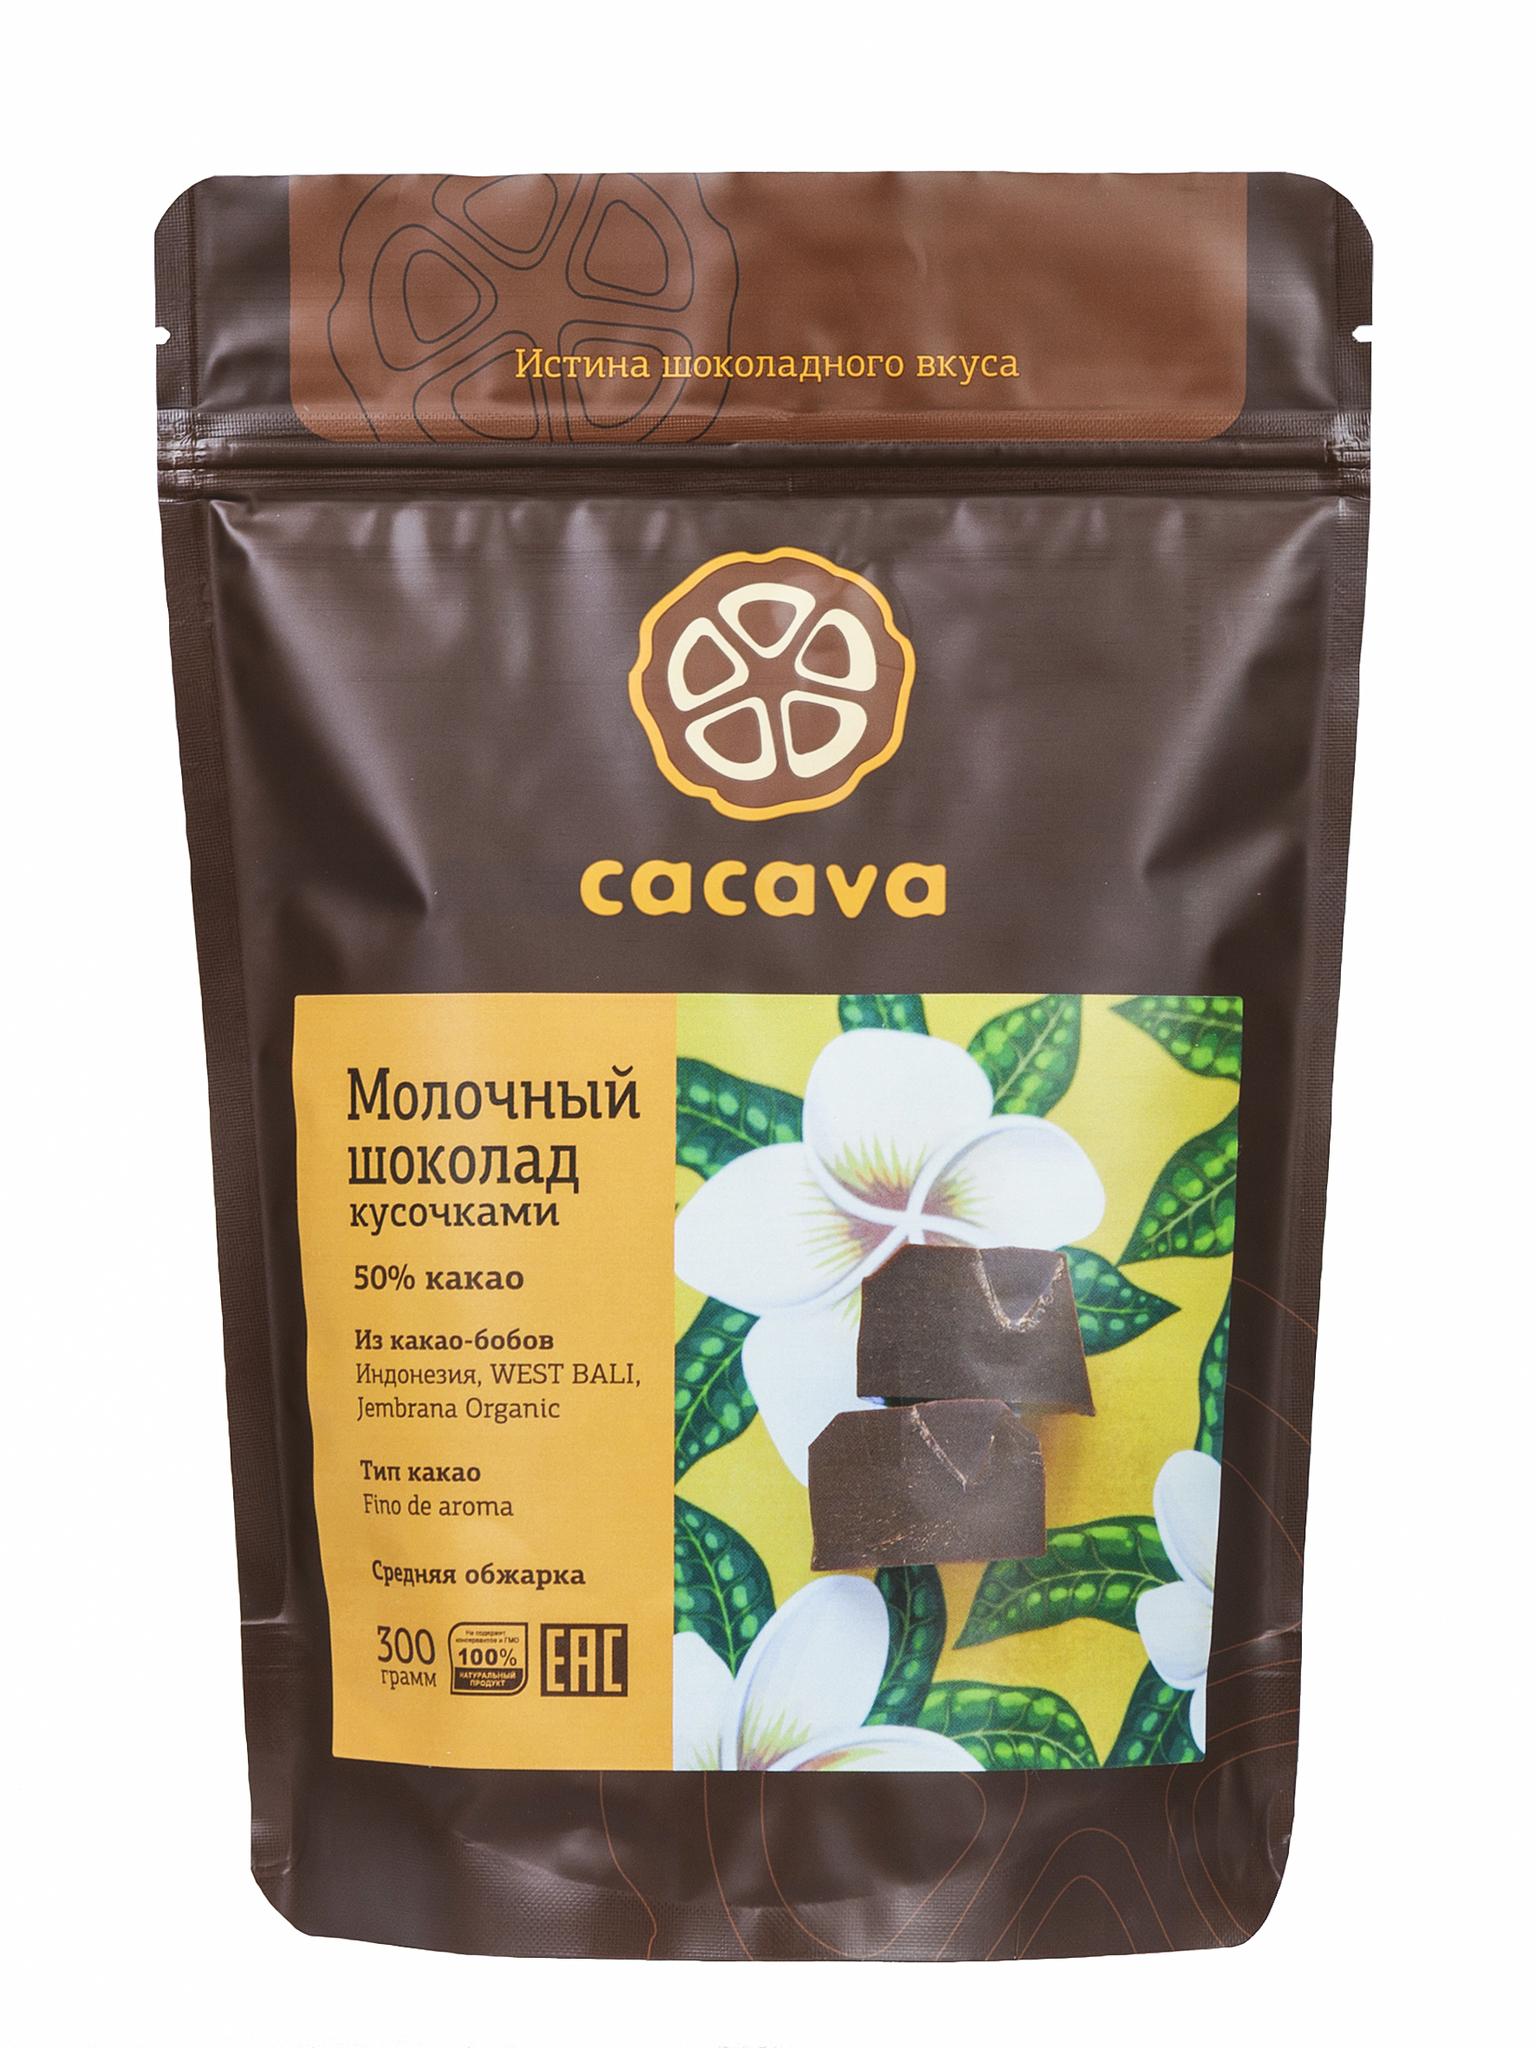 Молочный шоколад 50 % какао (Индонезия, WEST BALI, Jembrana), упаковка 300 грамм